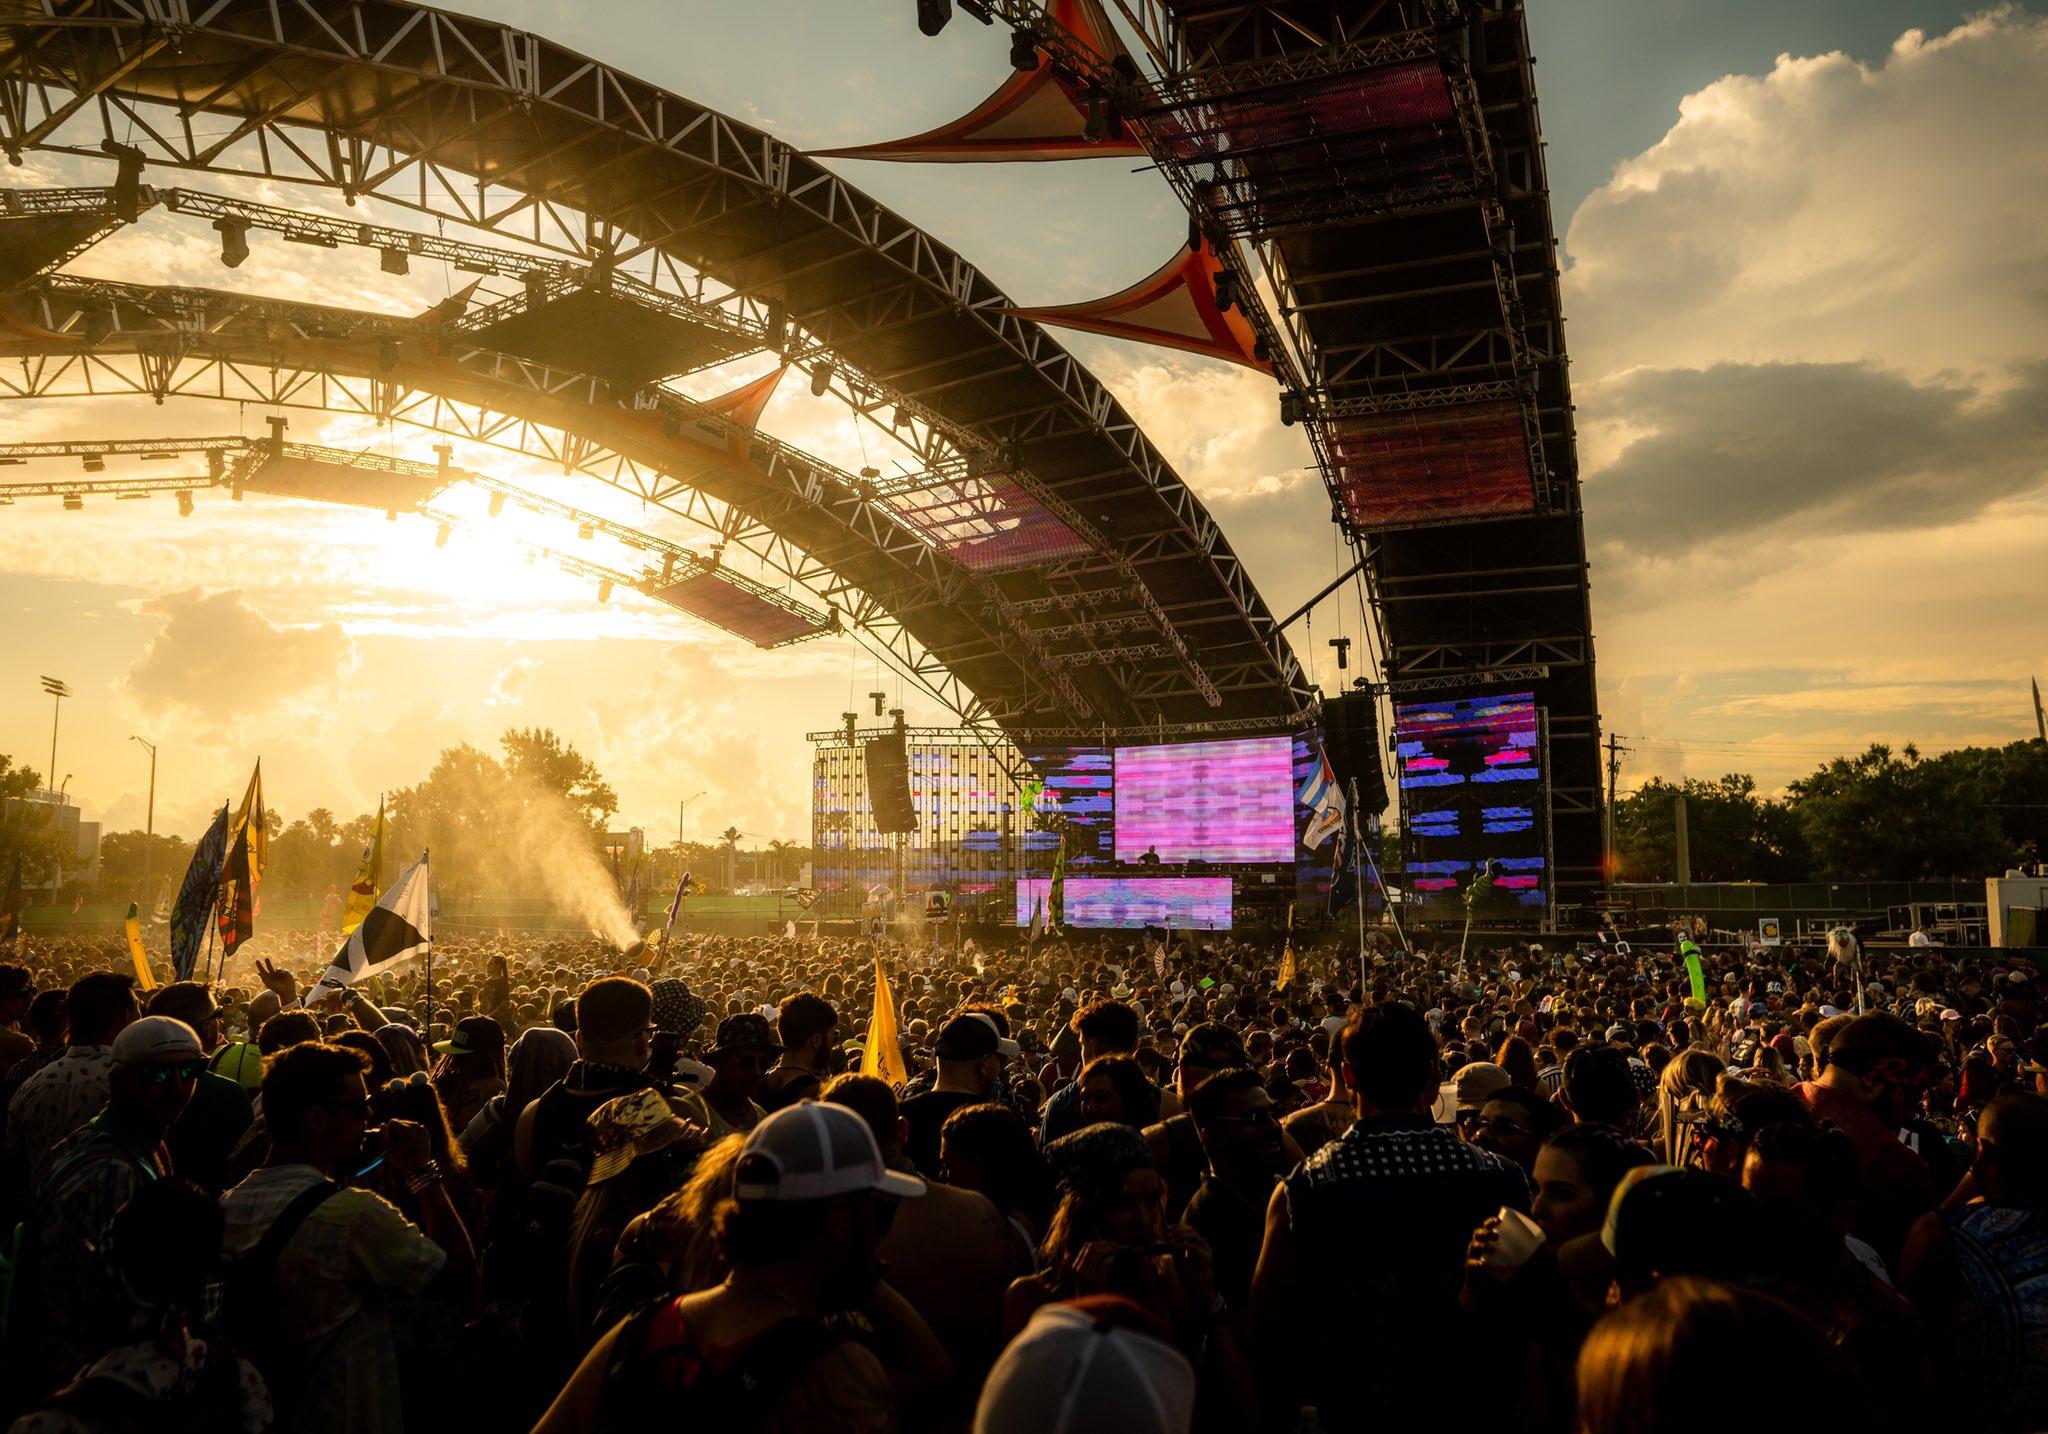 Sunset Music Festival 2021 INZO